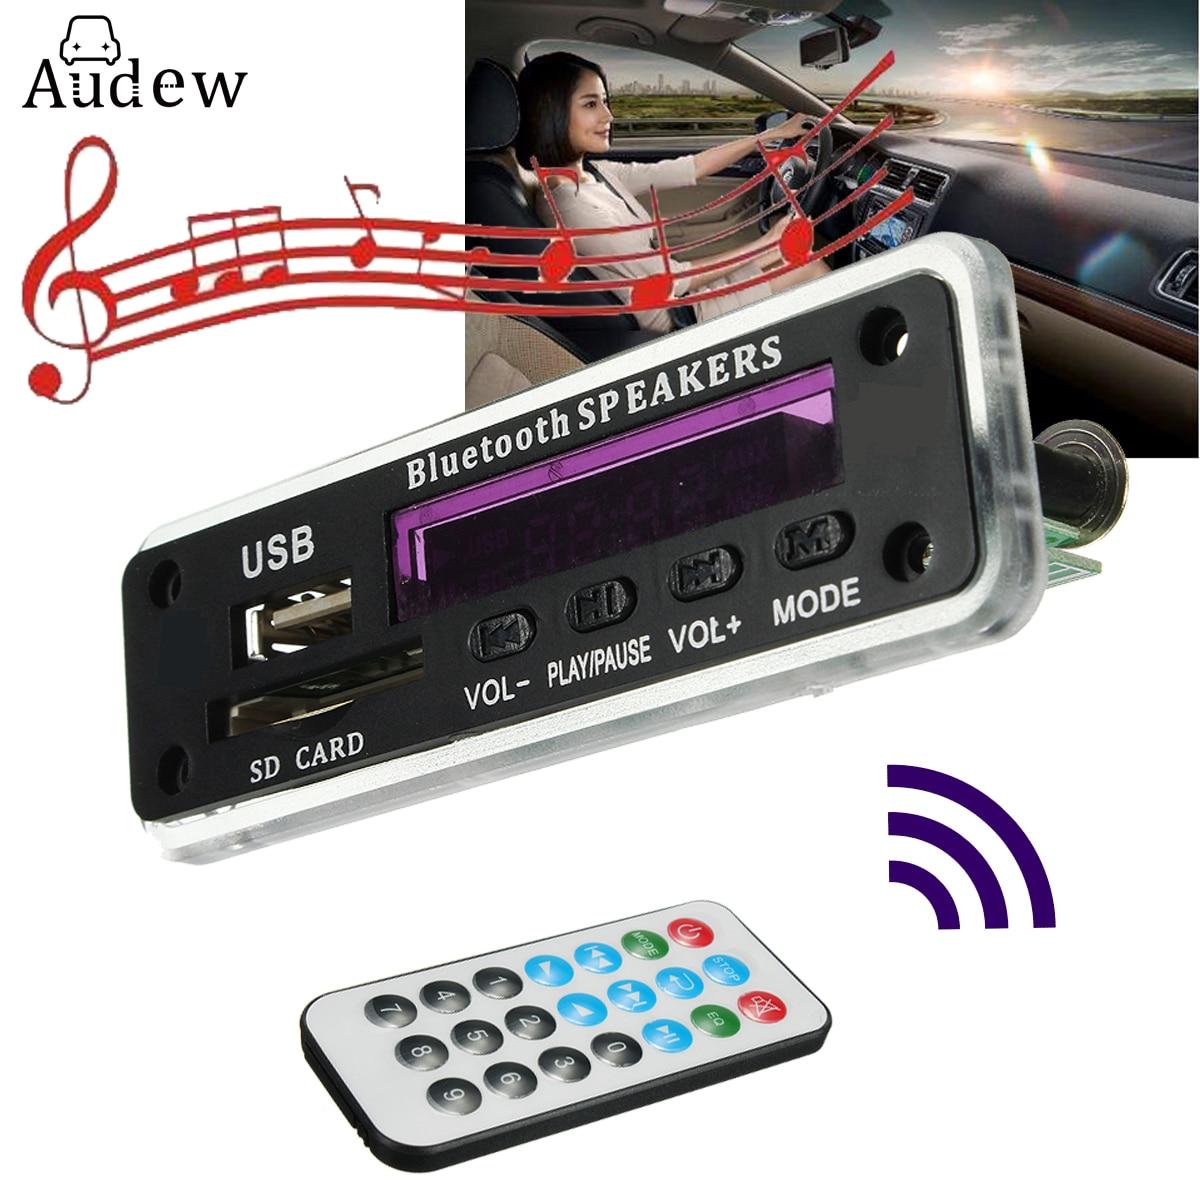 LEORY bluetooth MP3 Decoder Board Audio Module Wireless 12V MP3 WMA DAC Decoding Board With Remote USB SD Card FM Radio For Car